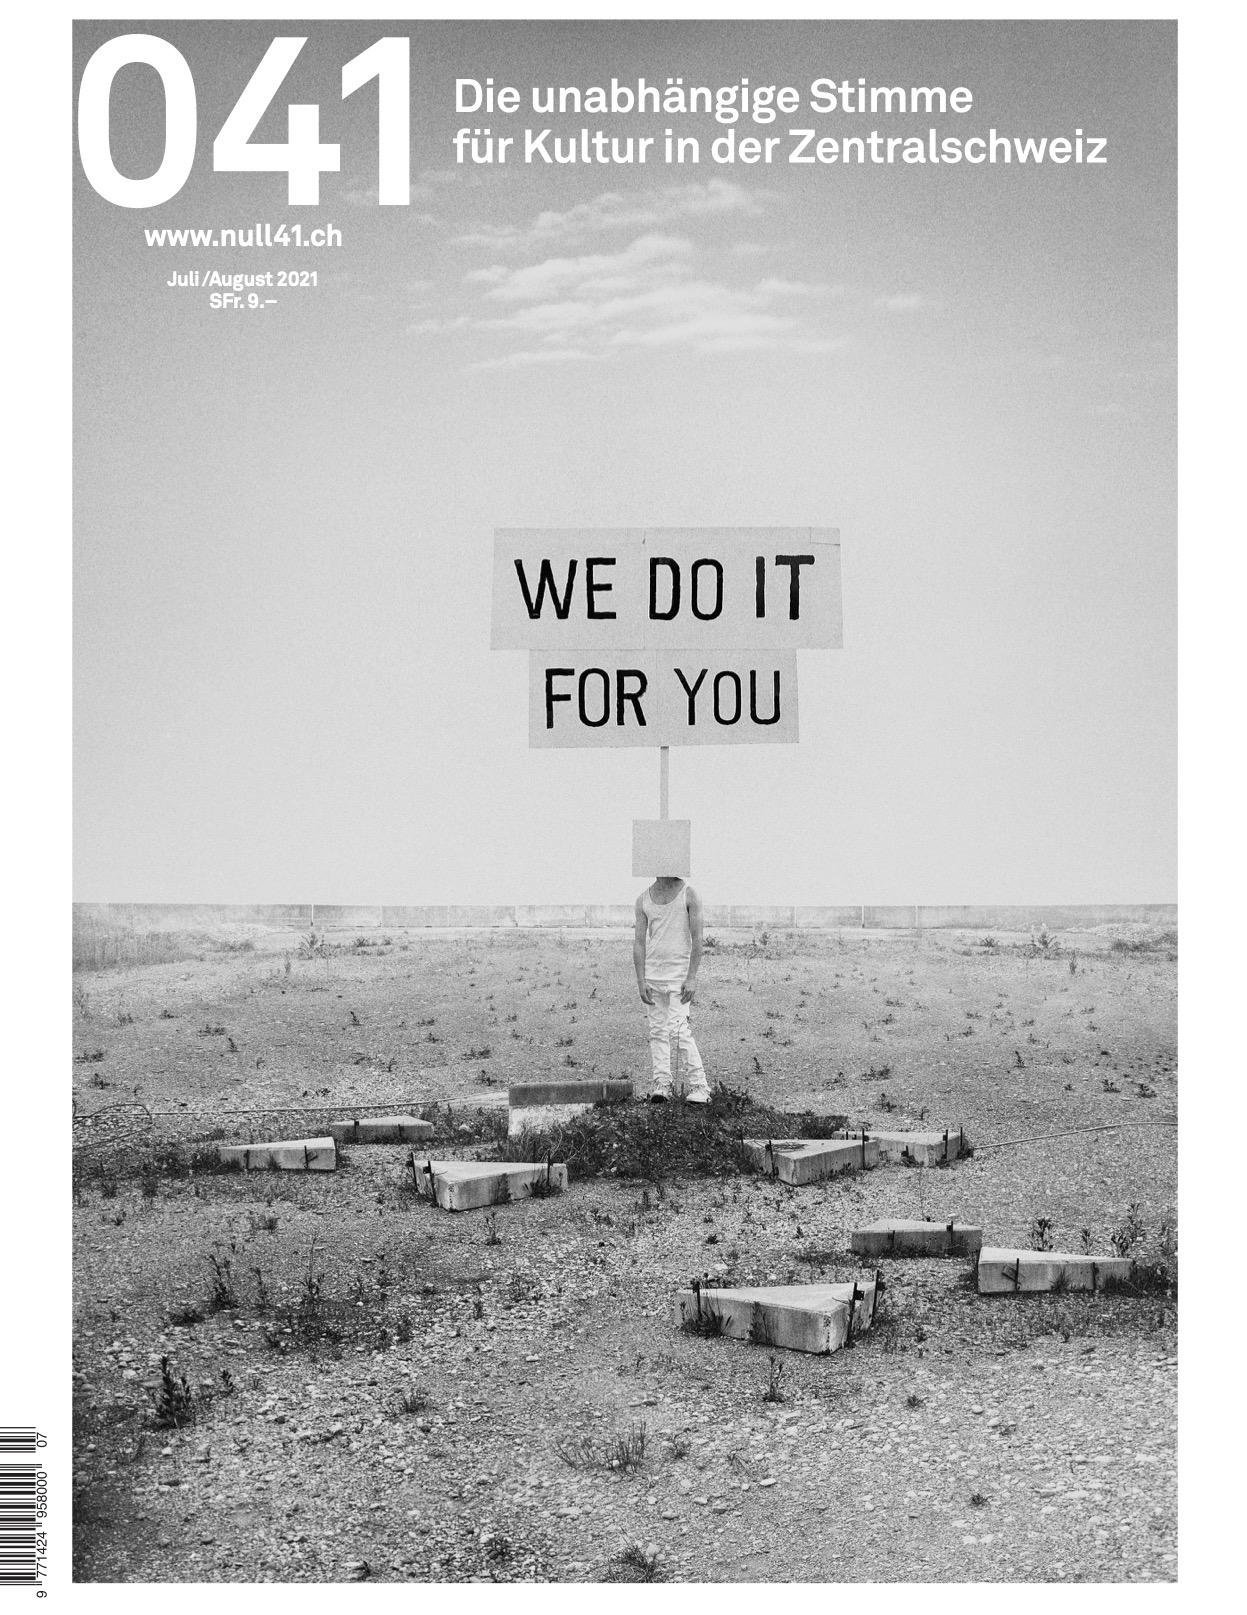 041 – Das Kulturmagazin 07-08/2021